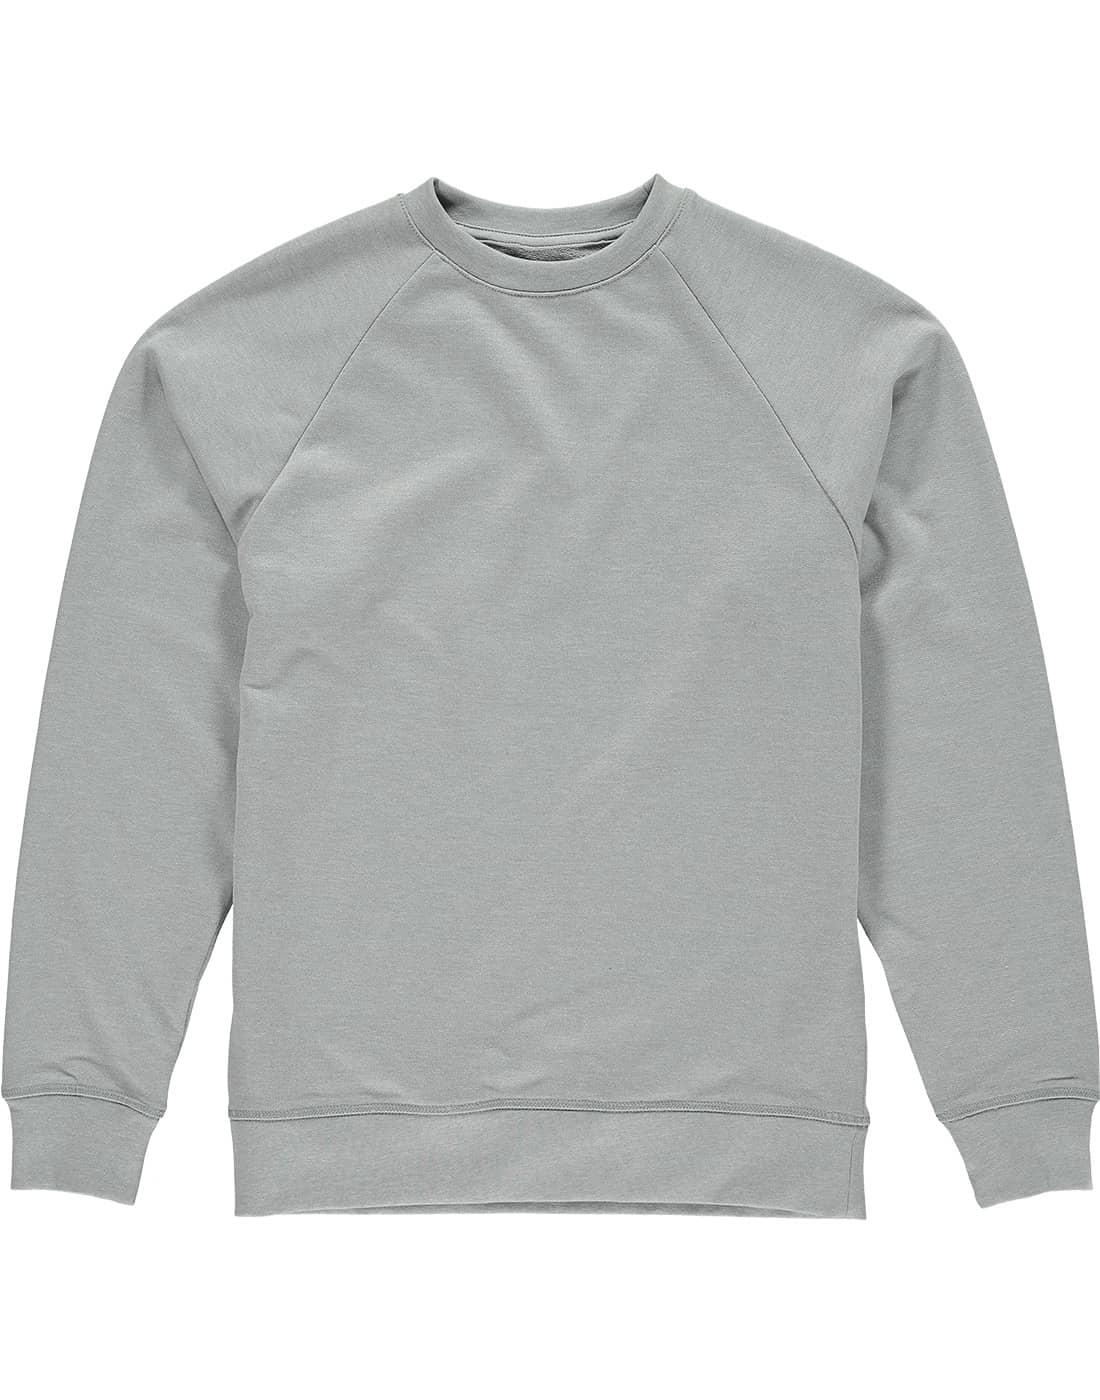 VANILLA Sublimation Sweatshirt